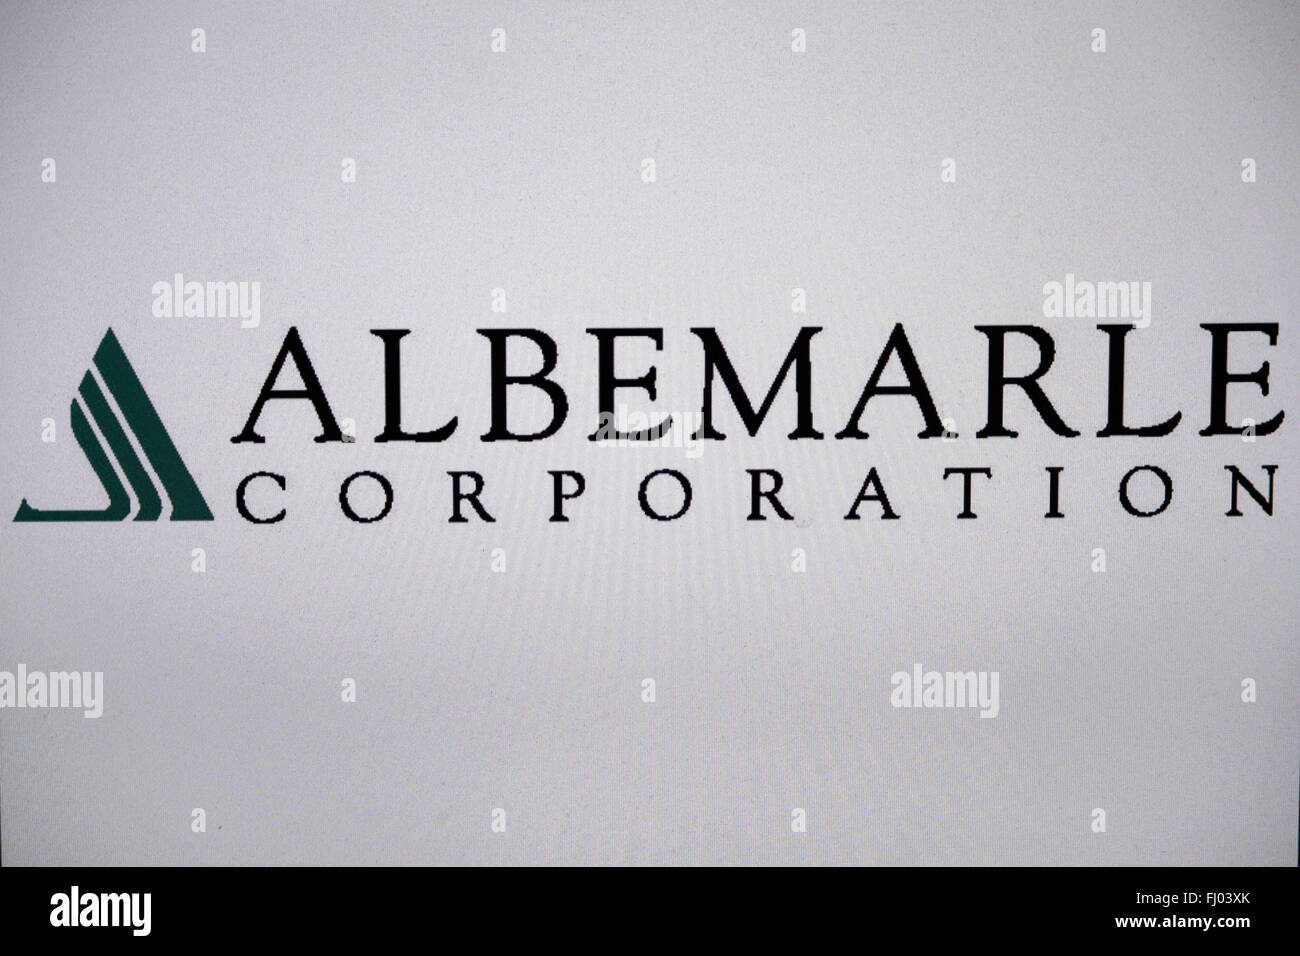 Markenname: 'Albemarle Corporation', Berlin. - Stock Image